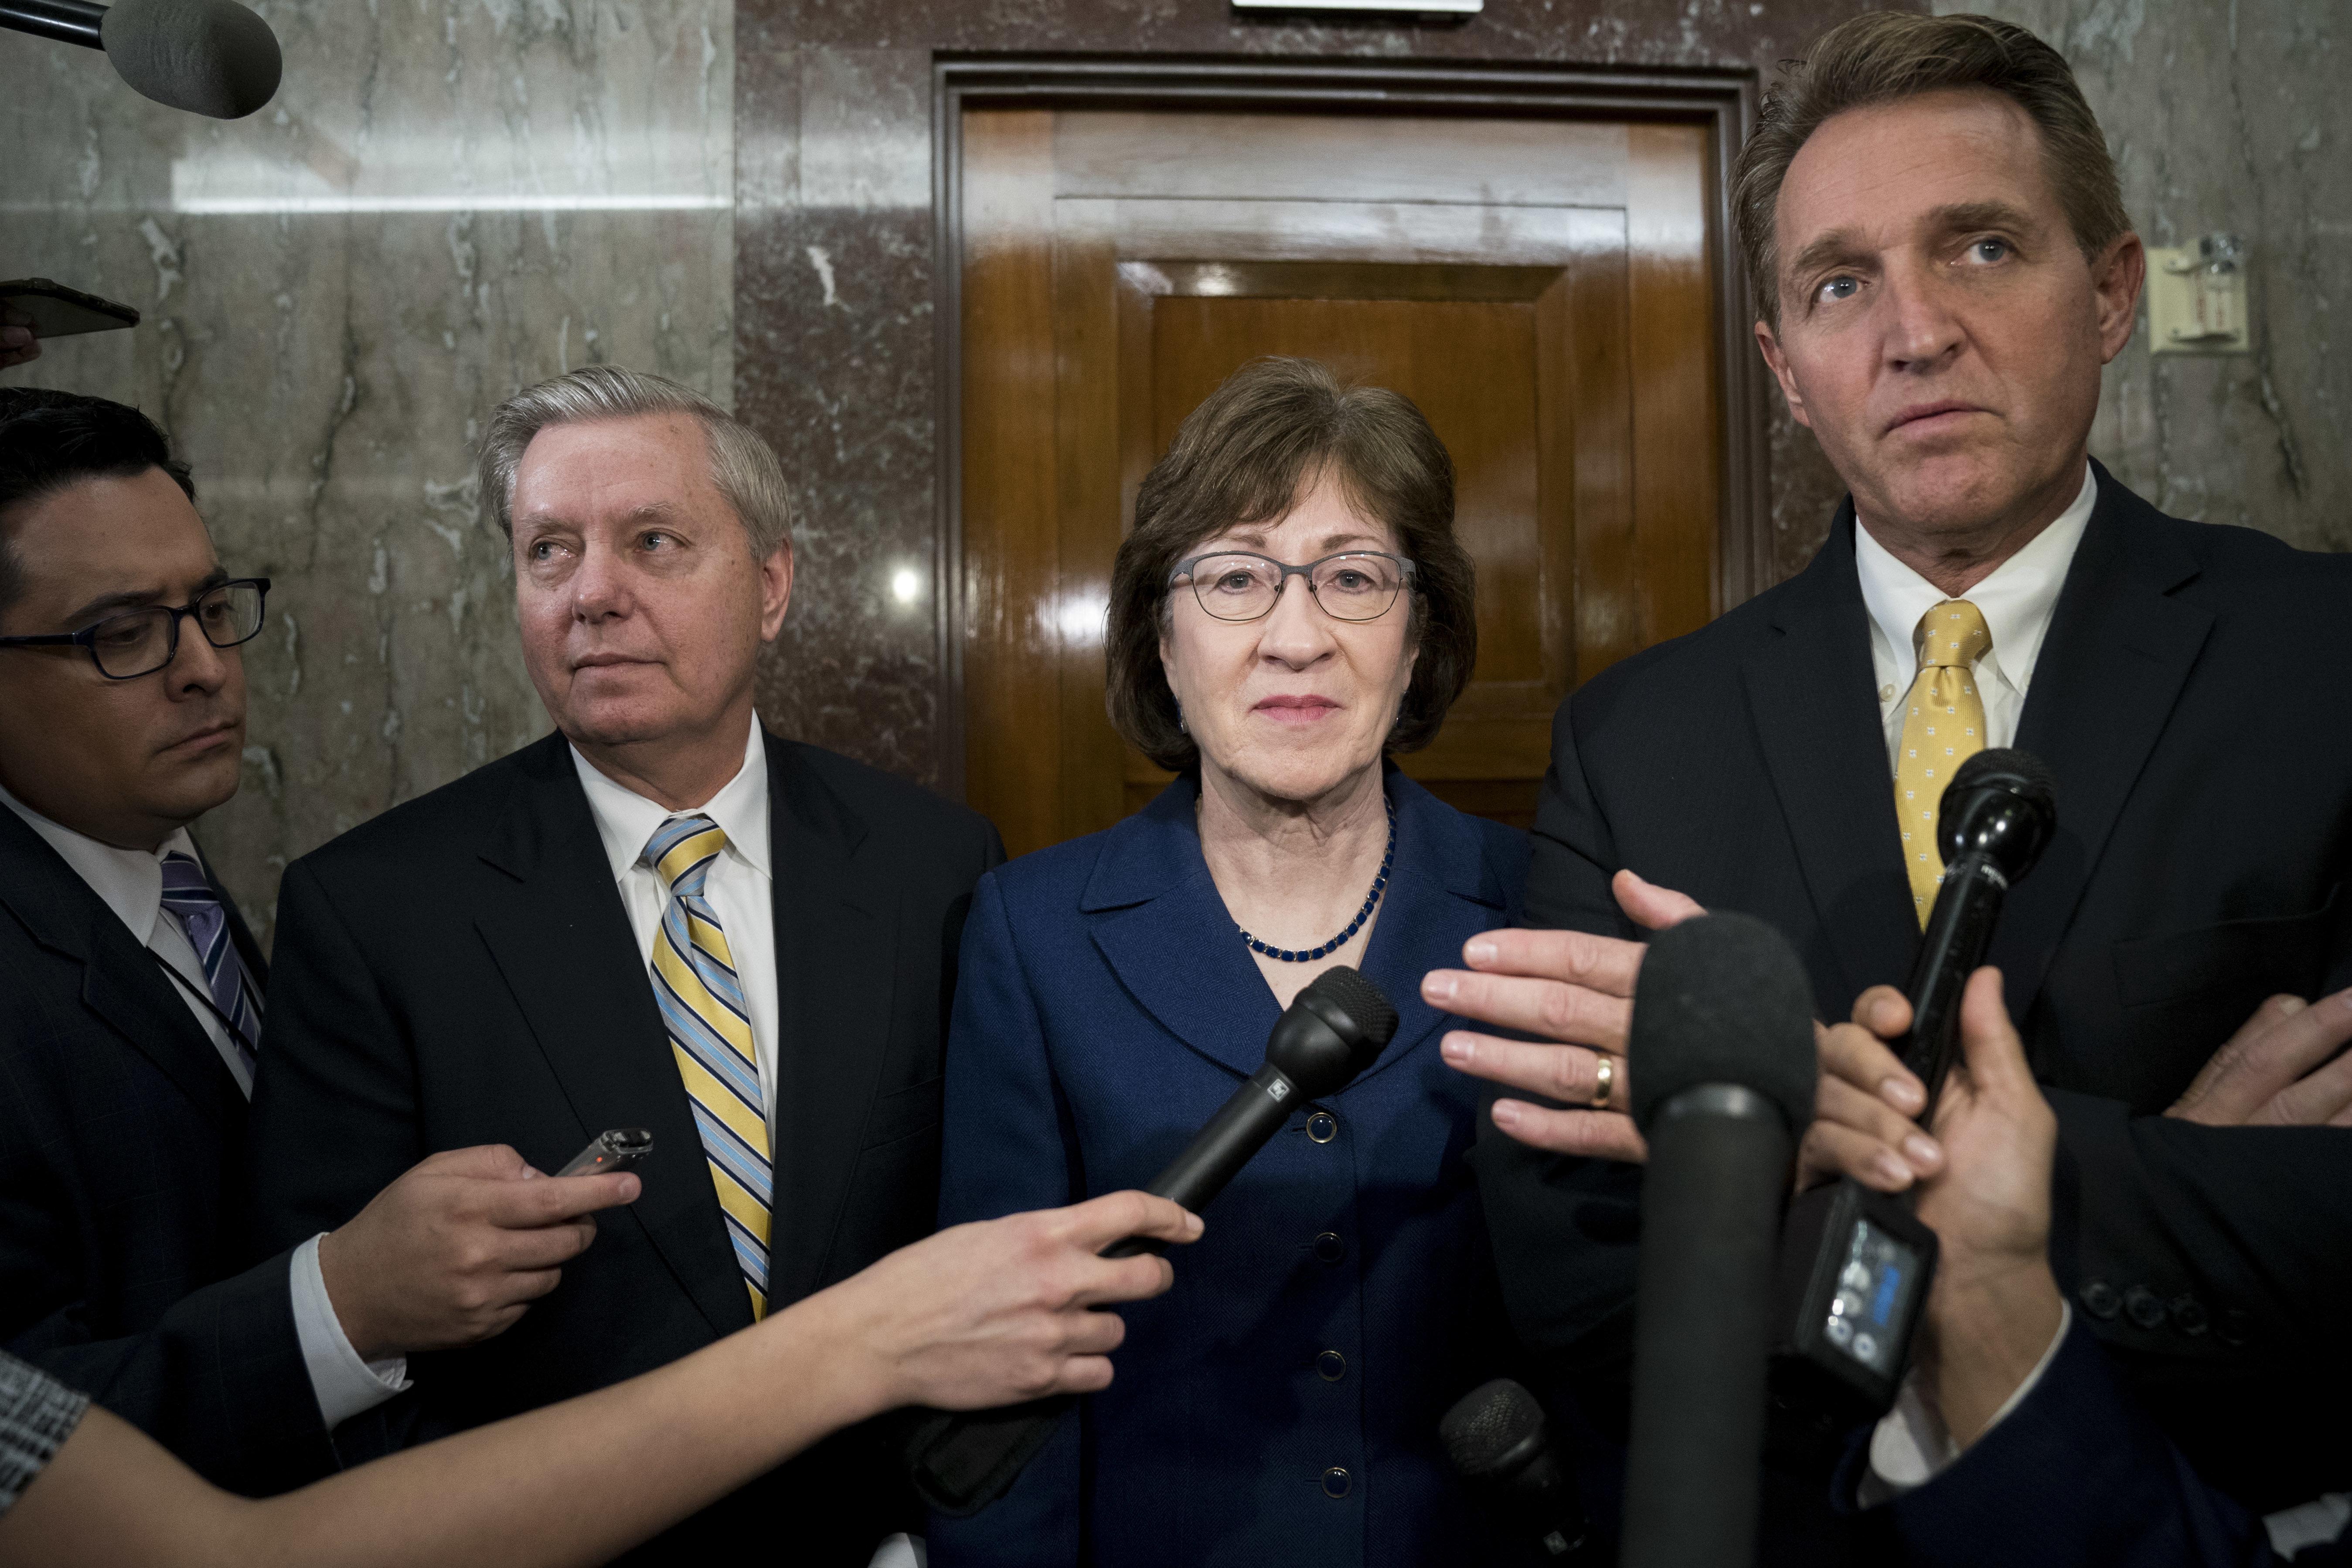 Trump's Mockery Of Christine Blasey Ford Draws GOP Concern